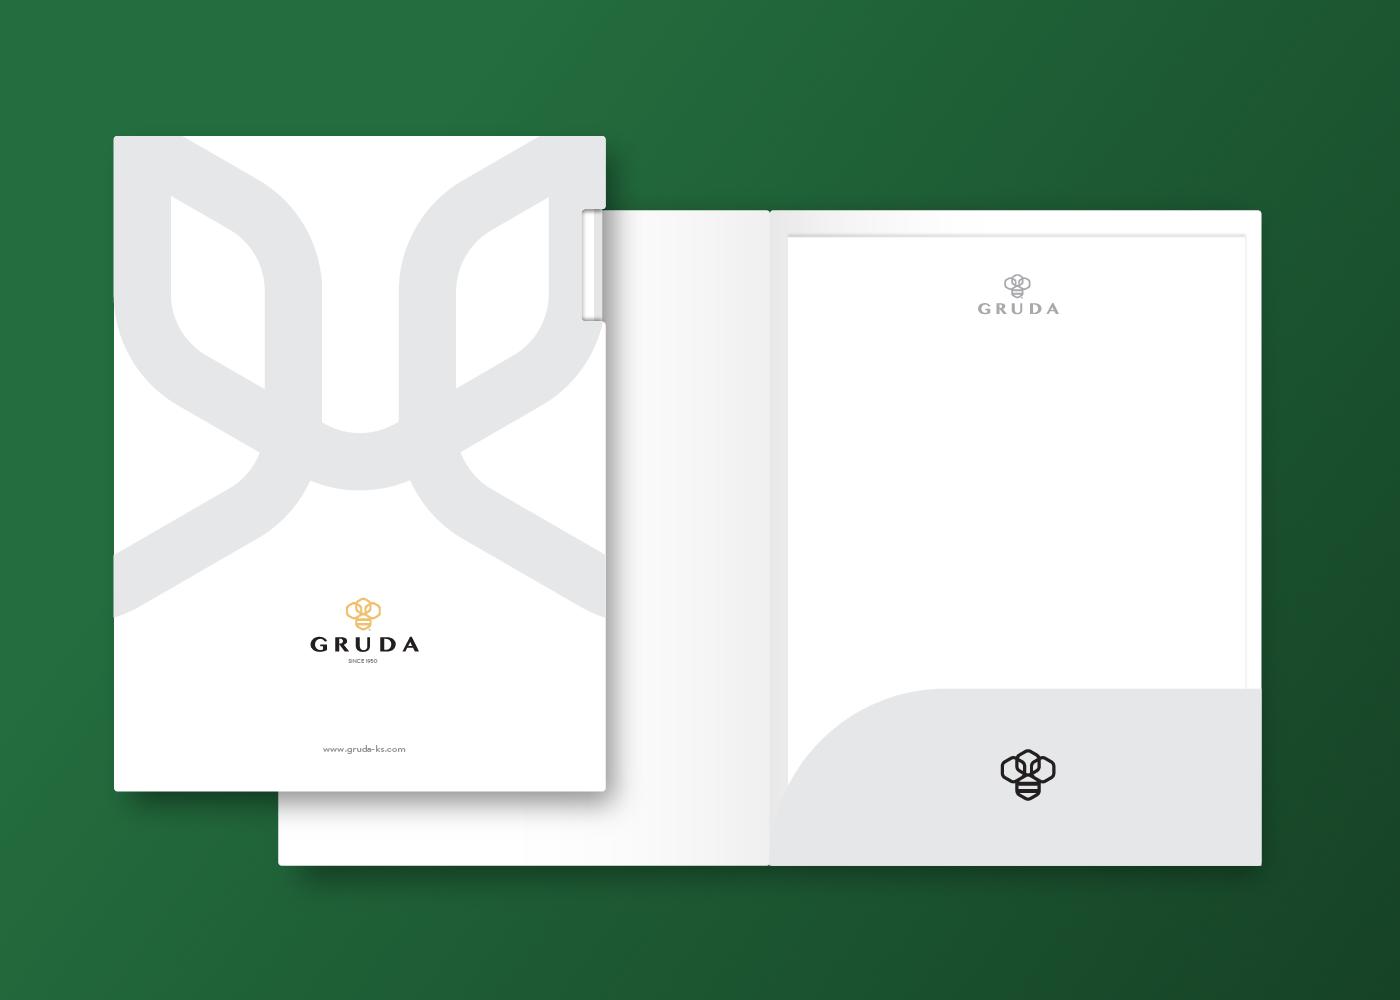 GRUDA - Branding